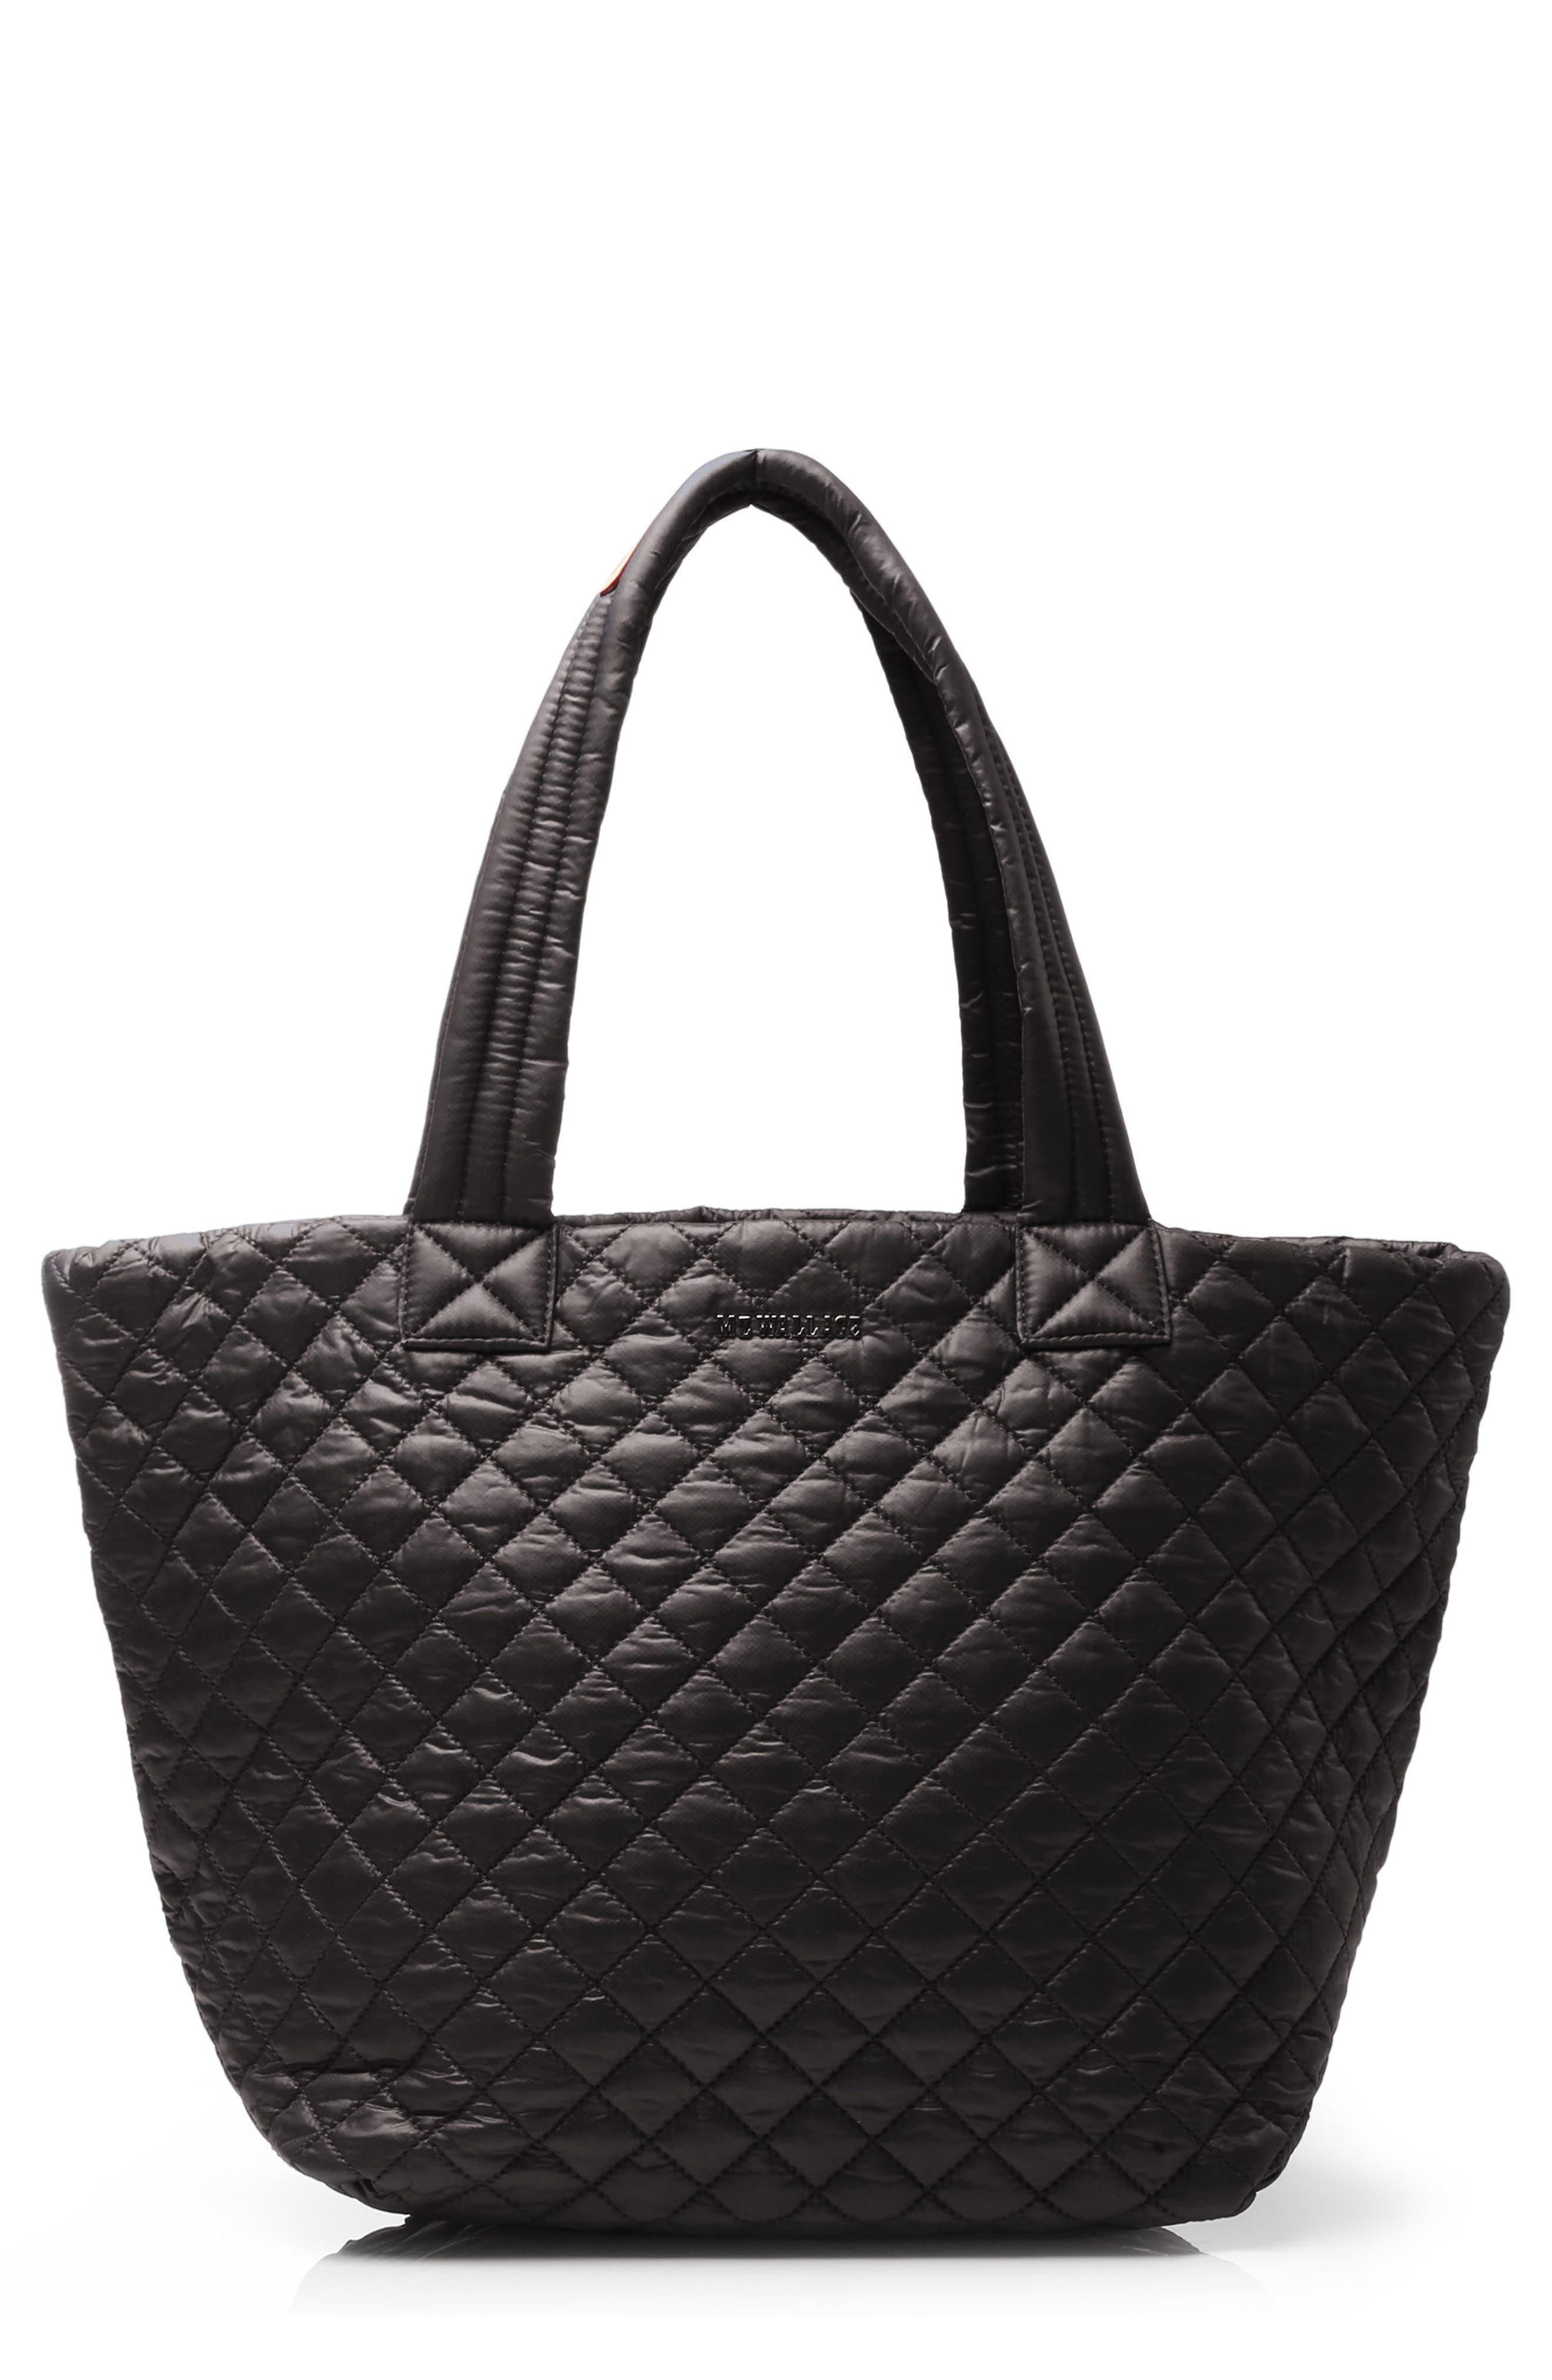 mz wallace handbags. MZ Wallace Medium Metro Tote Mz Handbags D